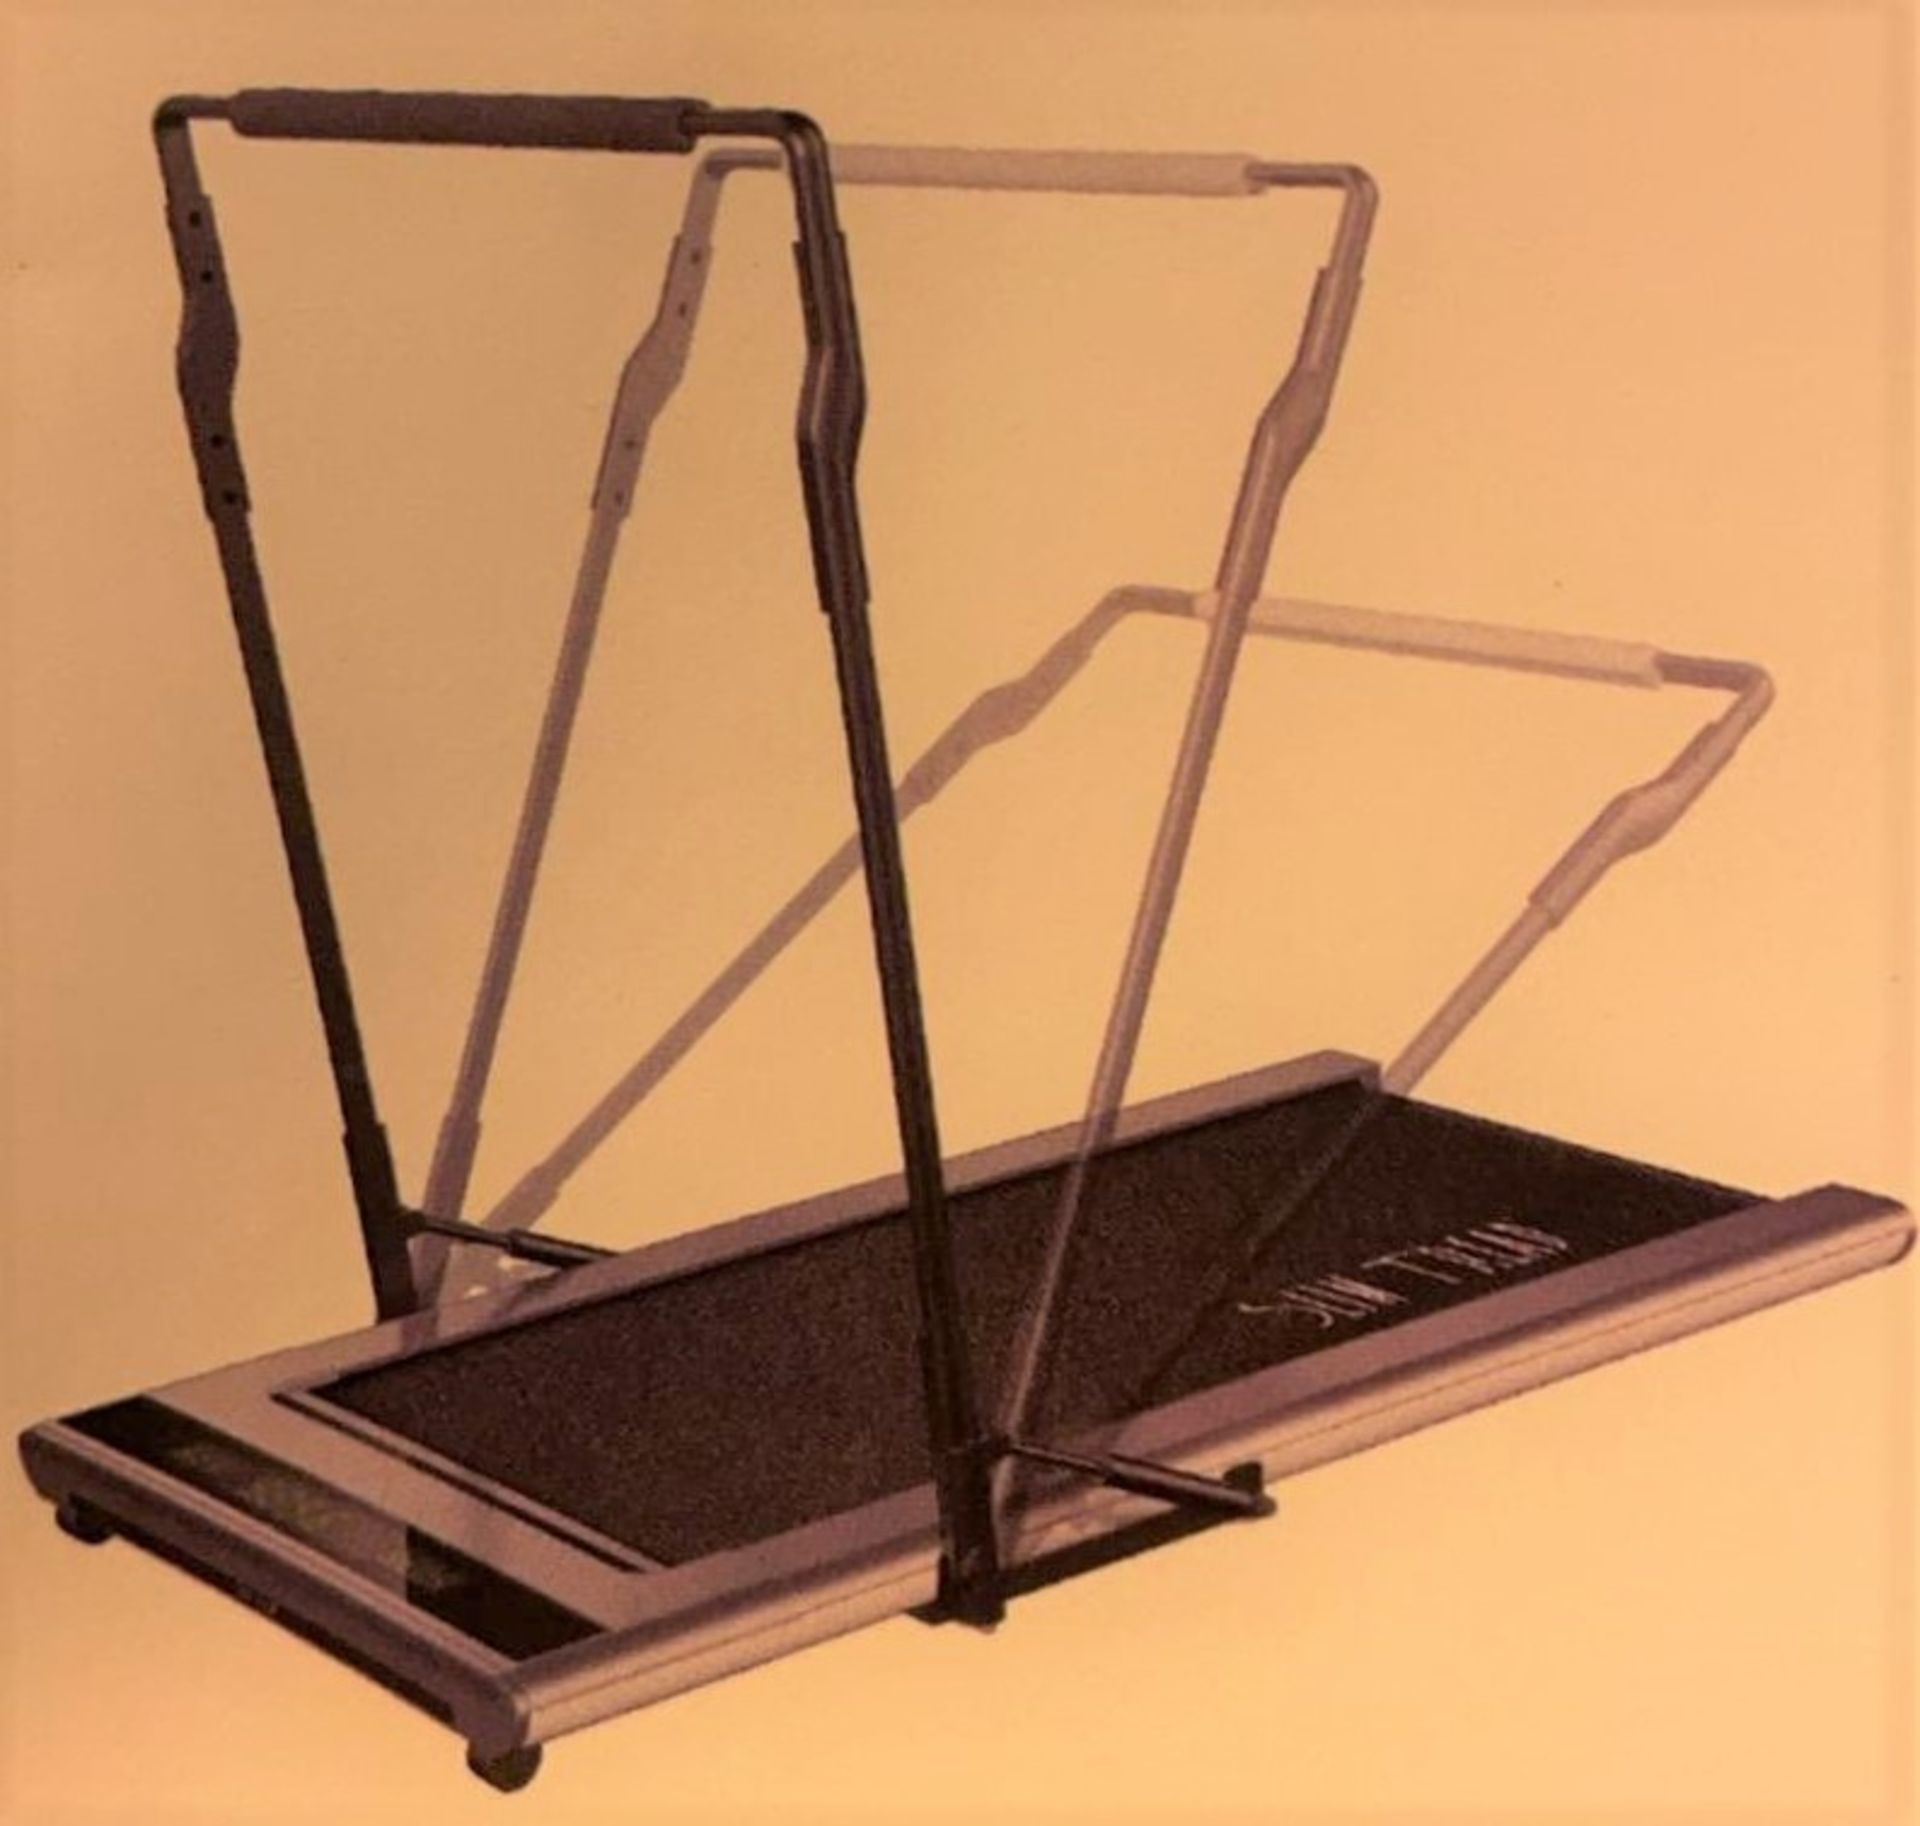 1 x Slim Tread Ultra Thin Smart Treadmill Running / Walking Machine - Lightweight With Folding - Image 5 of 23